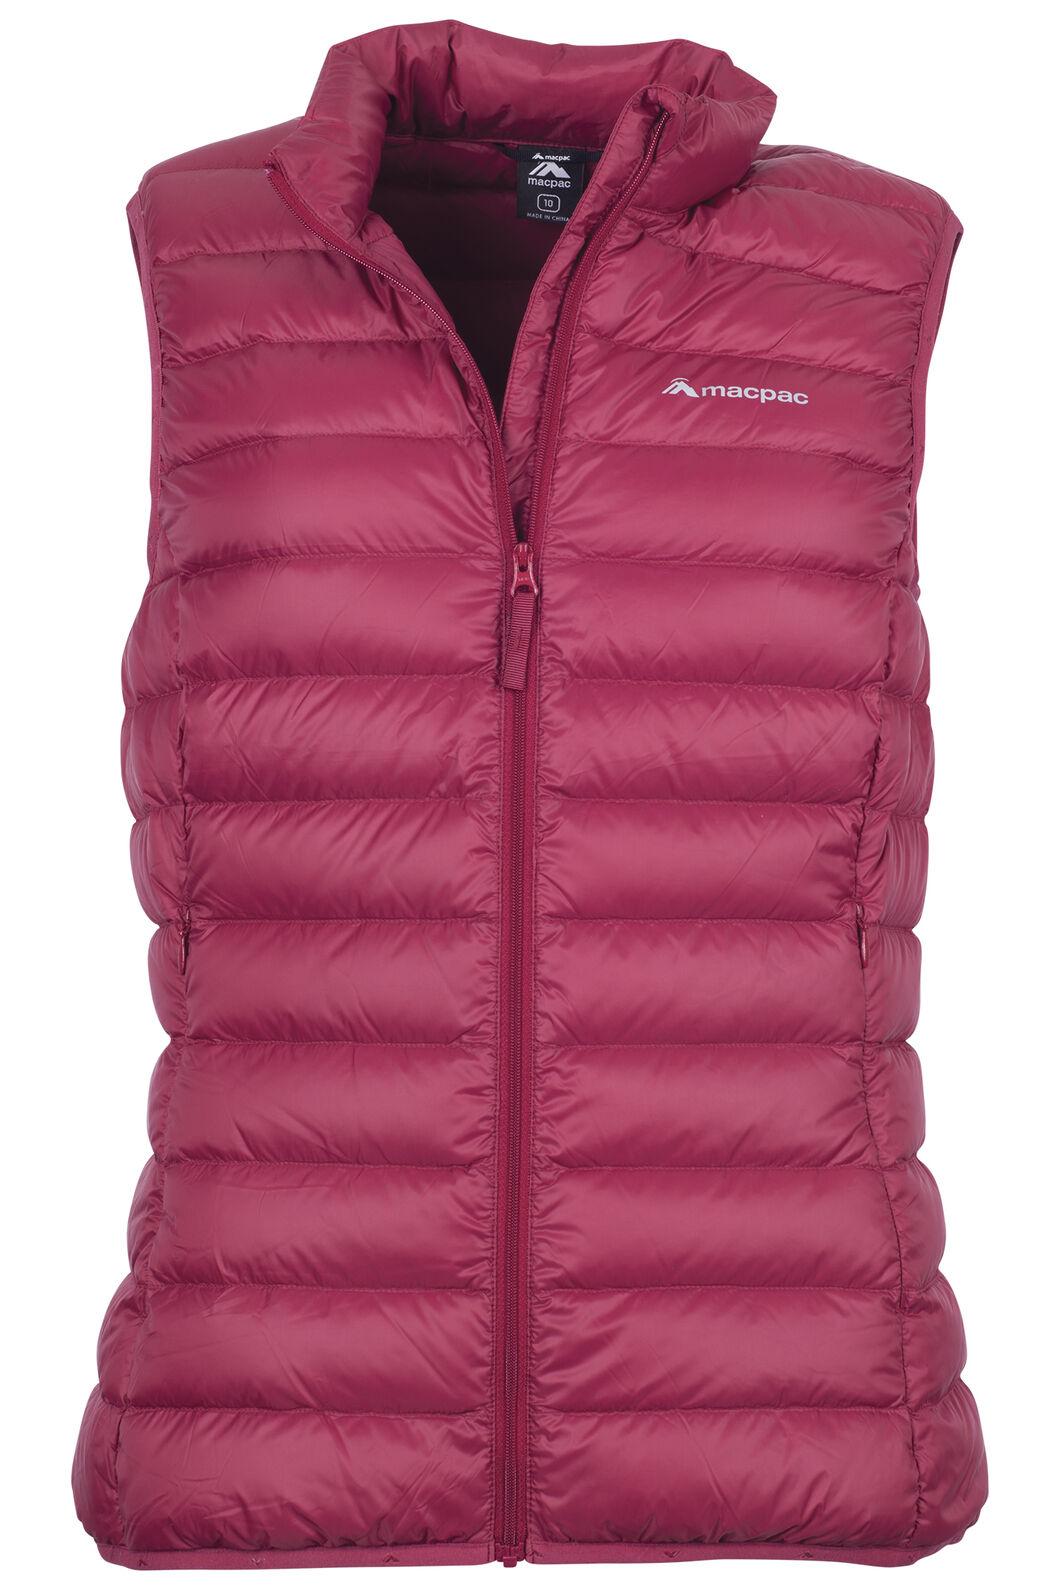 Macpac Uber Light Down Vest — Women's, Rumba Red, hi-res